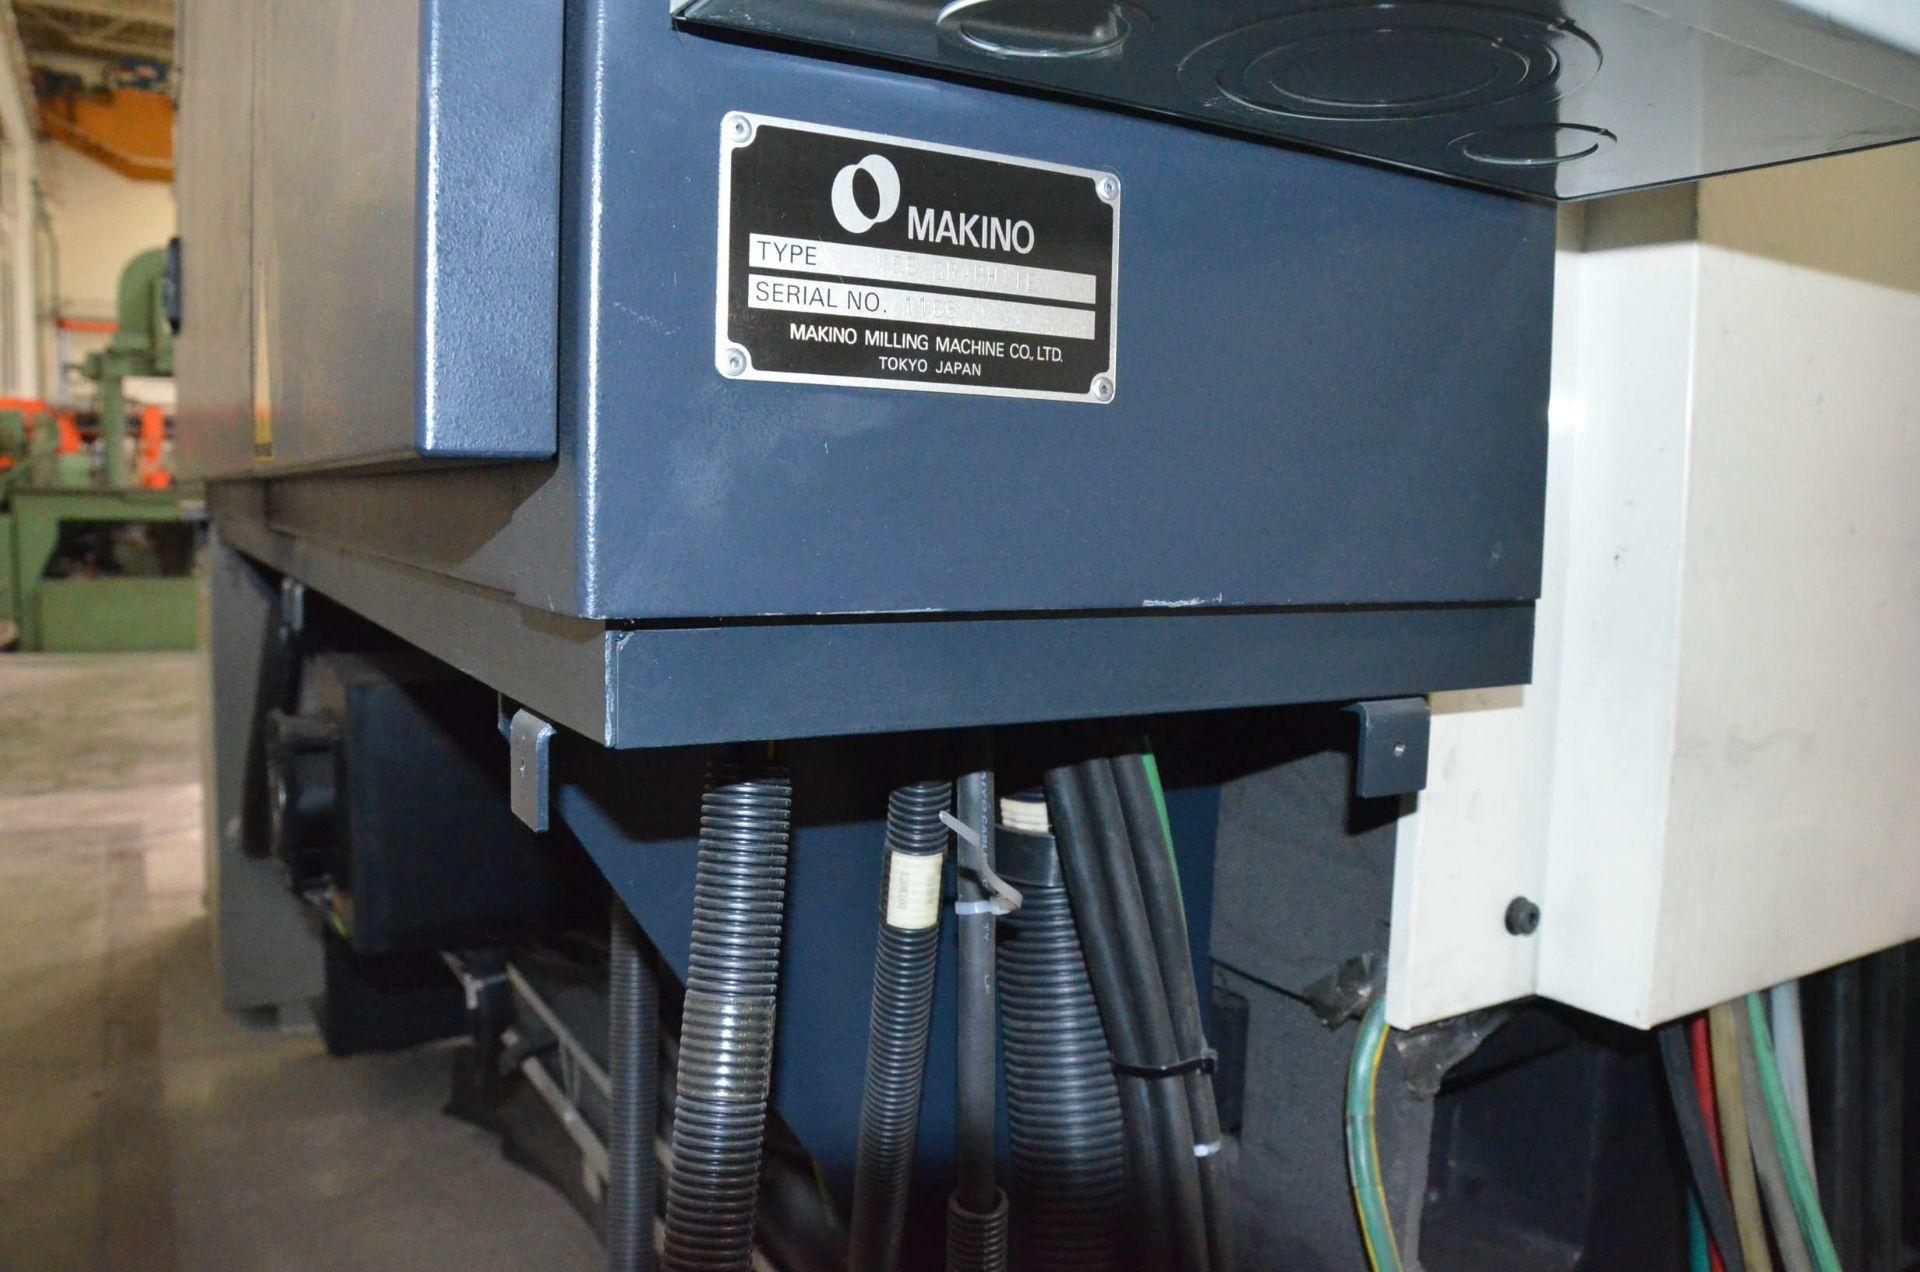 MAKINO (2008) V56 GRAPHITE CNC VERTICAL MACHINING CENTER WITH MAKINO PROFESSIONAL 5 TOUCHSCREEN - Image 10 of 10